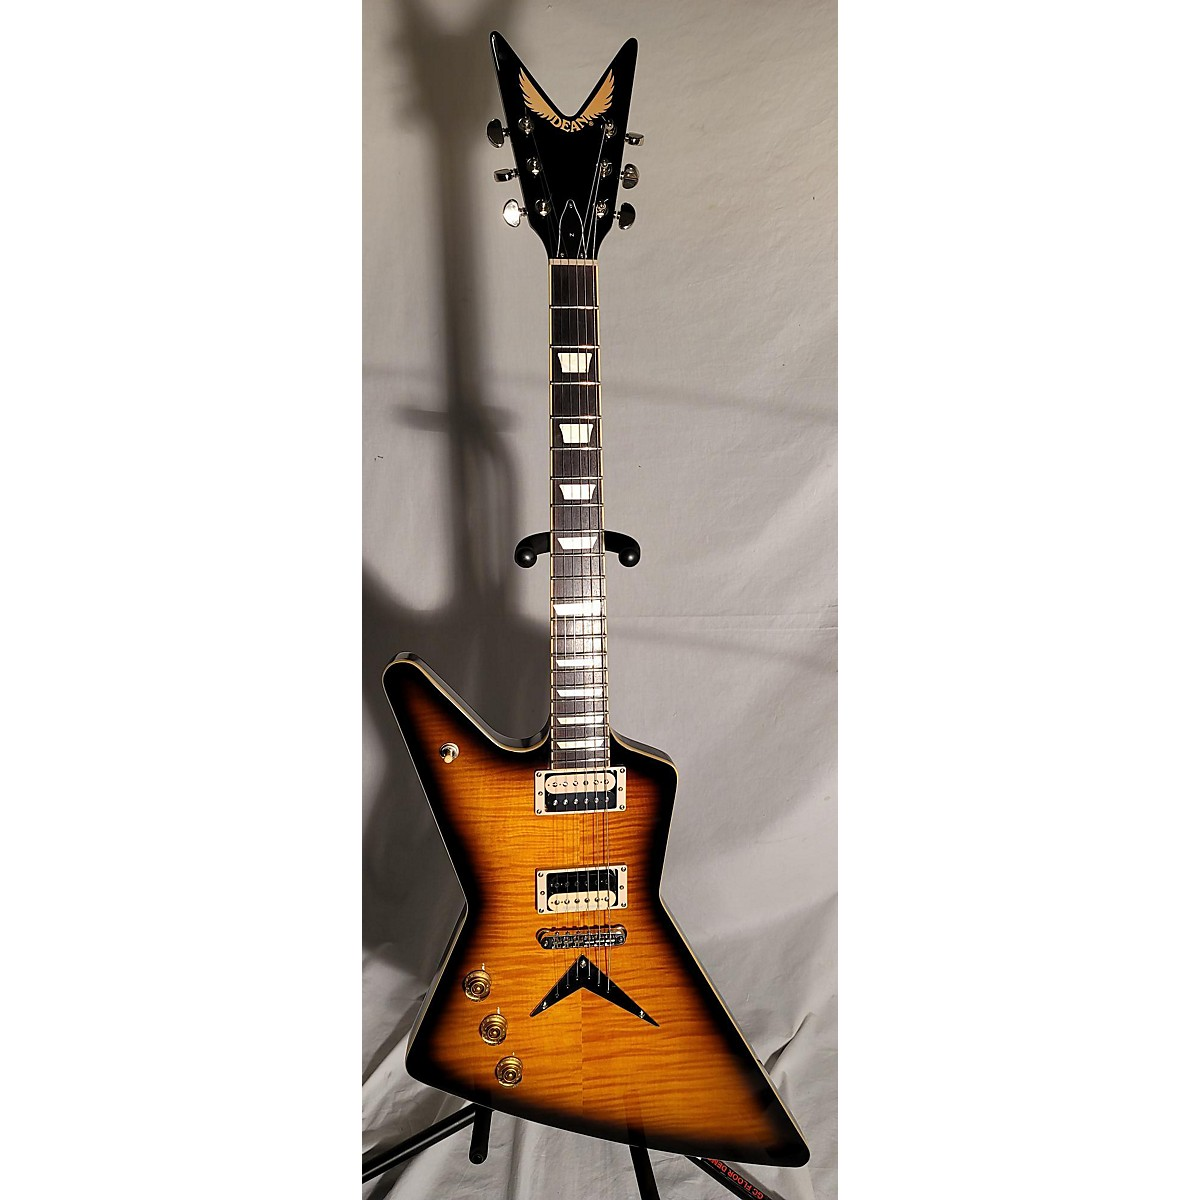 Dean Z 79 Solid Body Electric Guitar